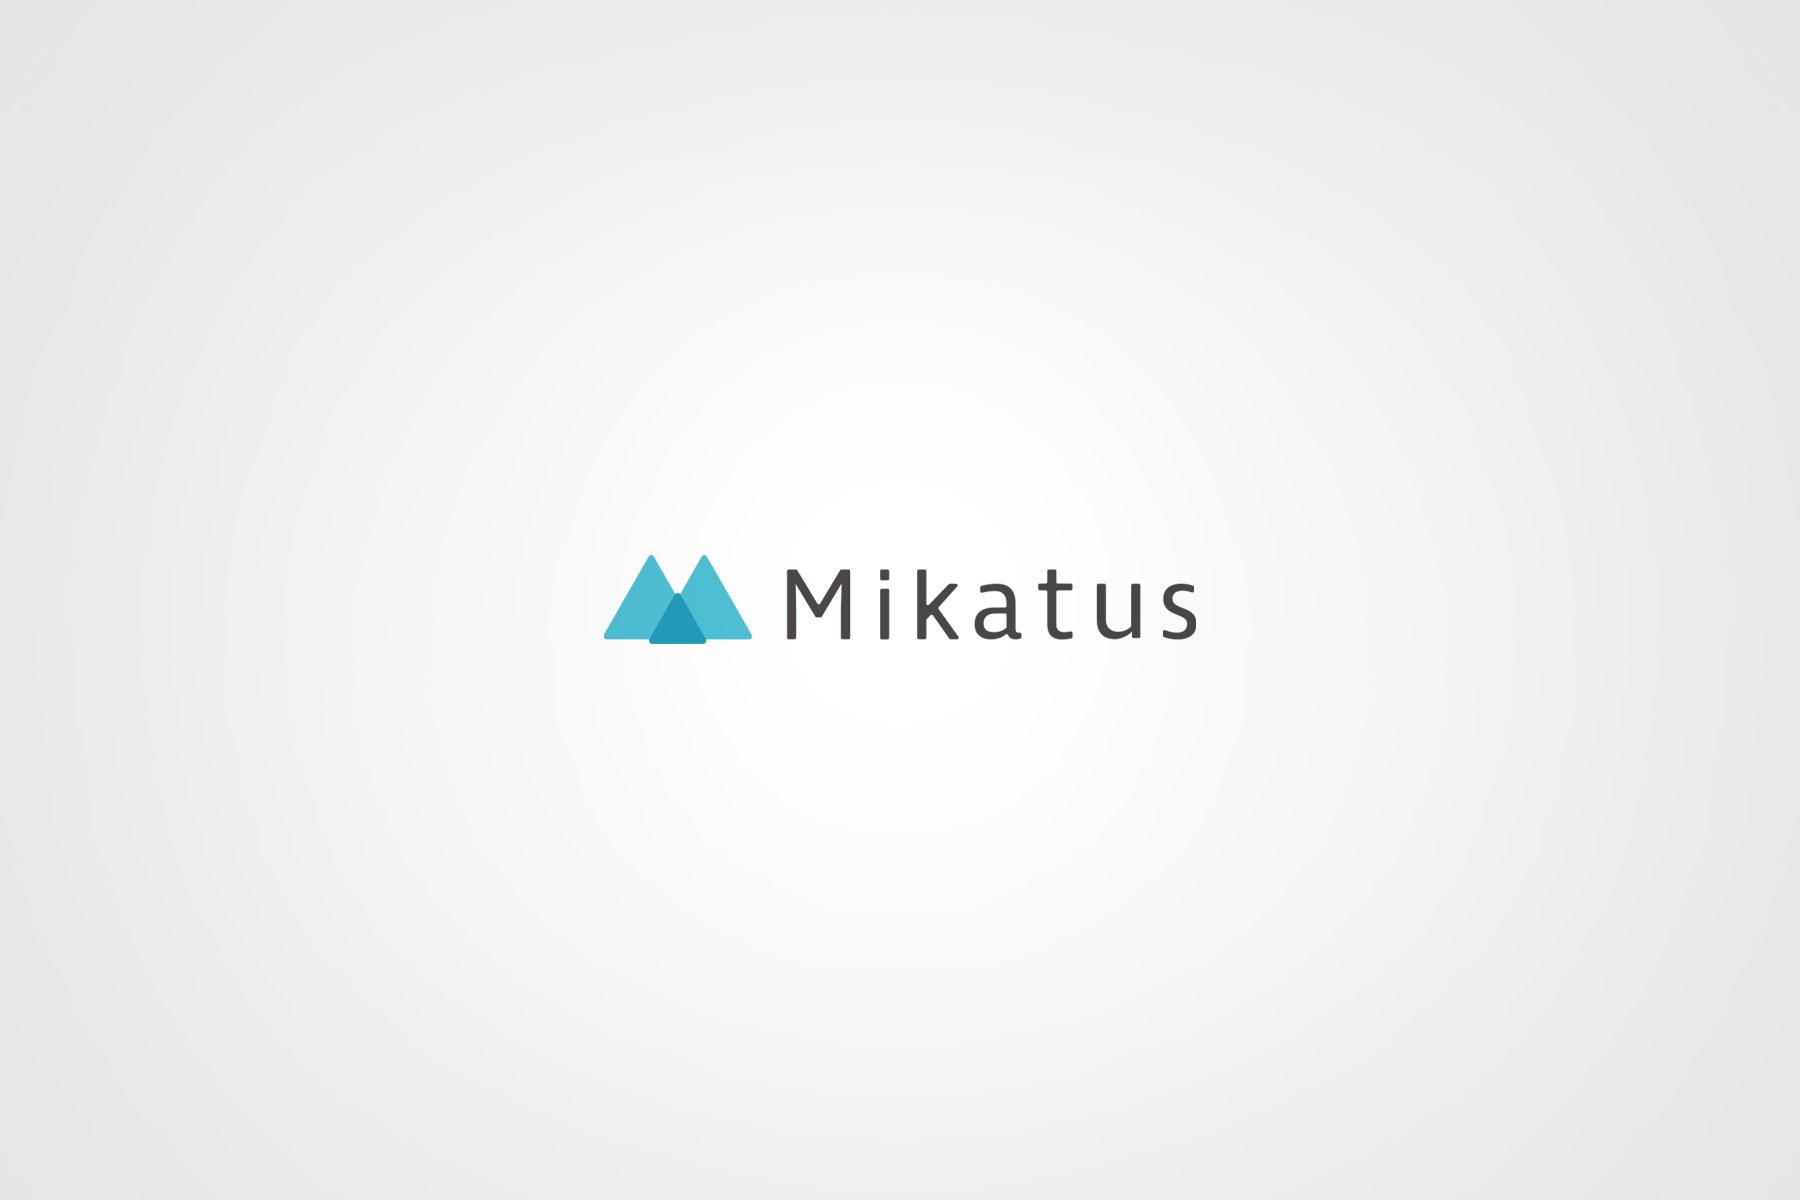 Mikatus株式会社のトップ画像